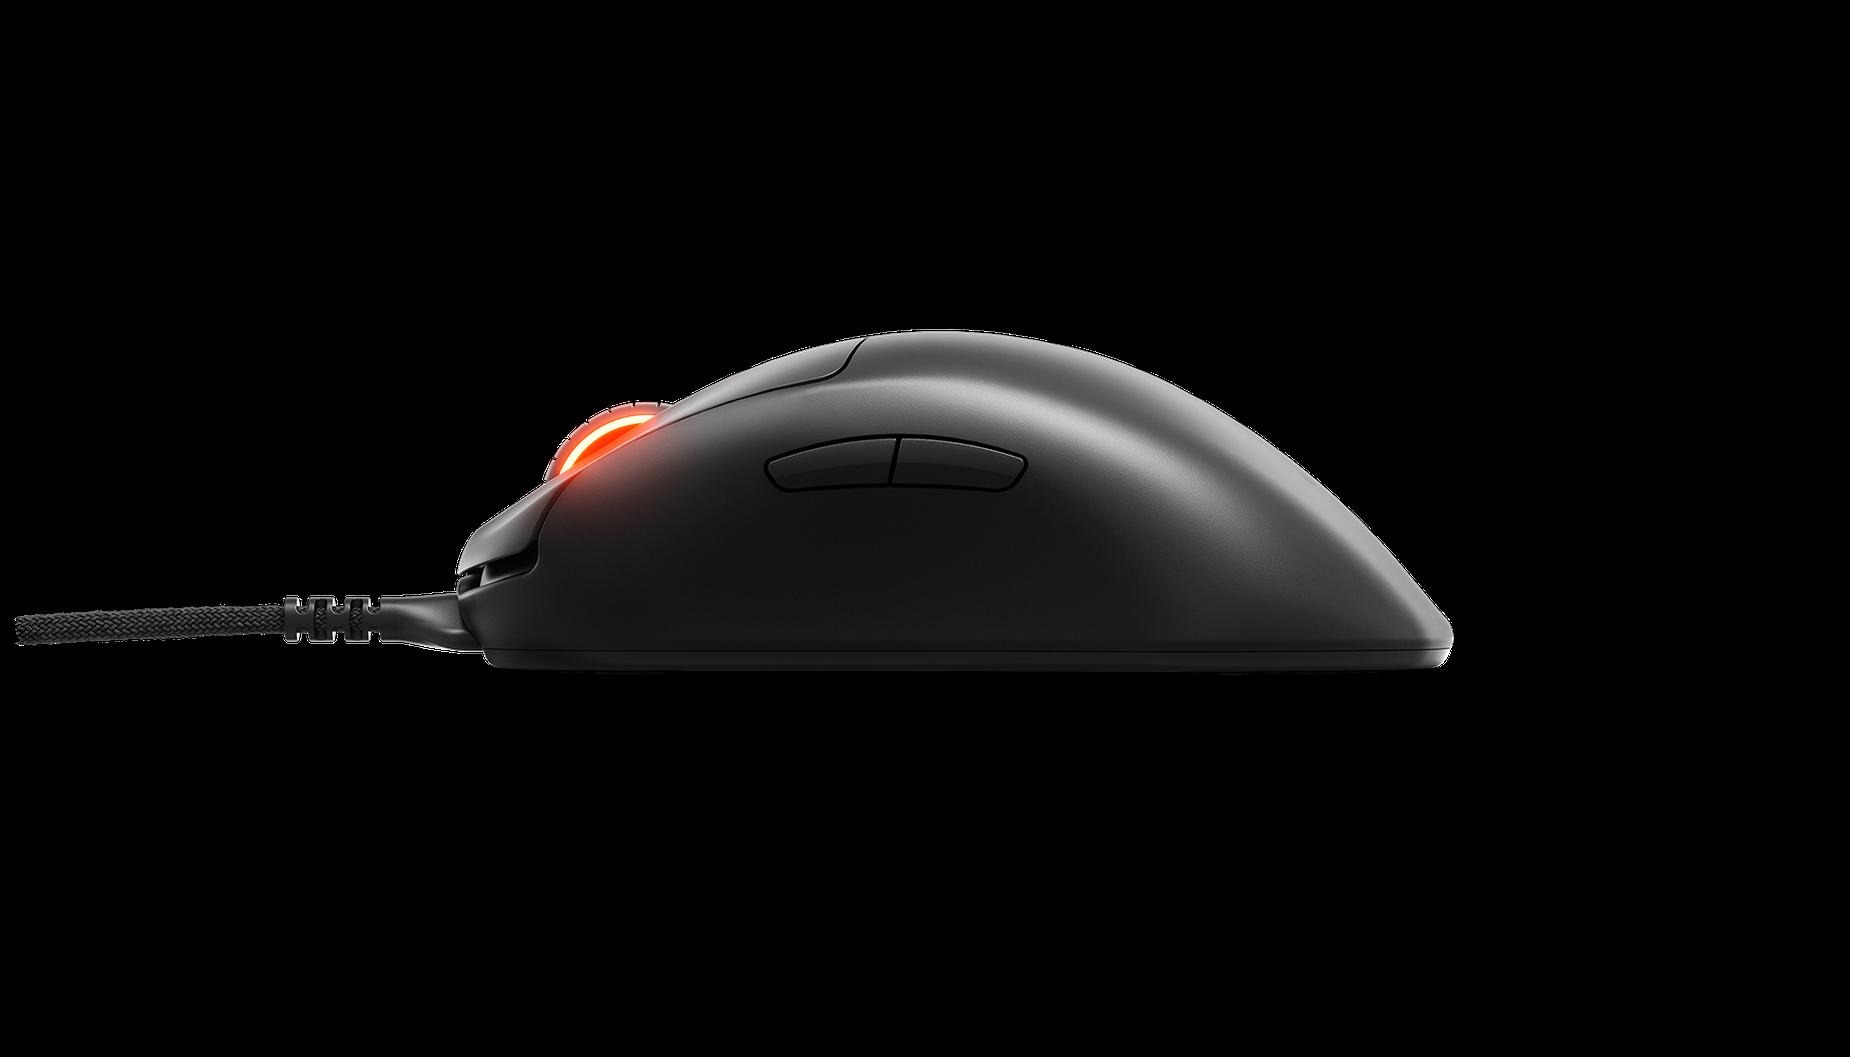 Prime + 滑鼠的側視圖。